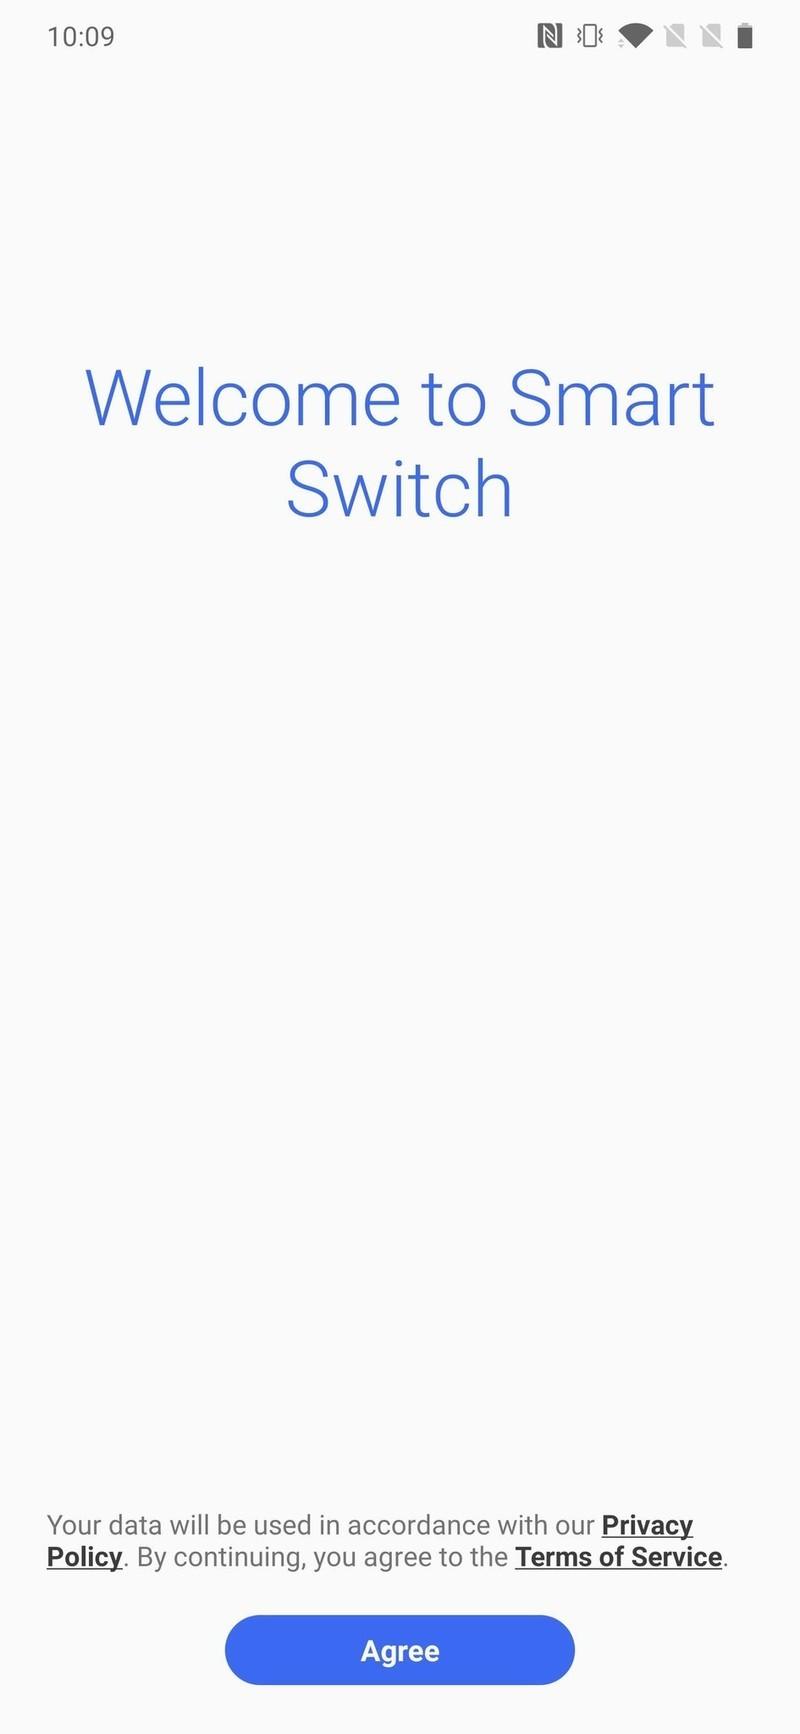 samsung-smart-switch-joe-1.jpg